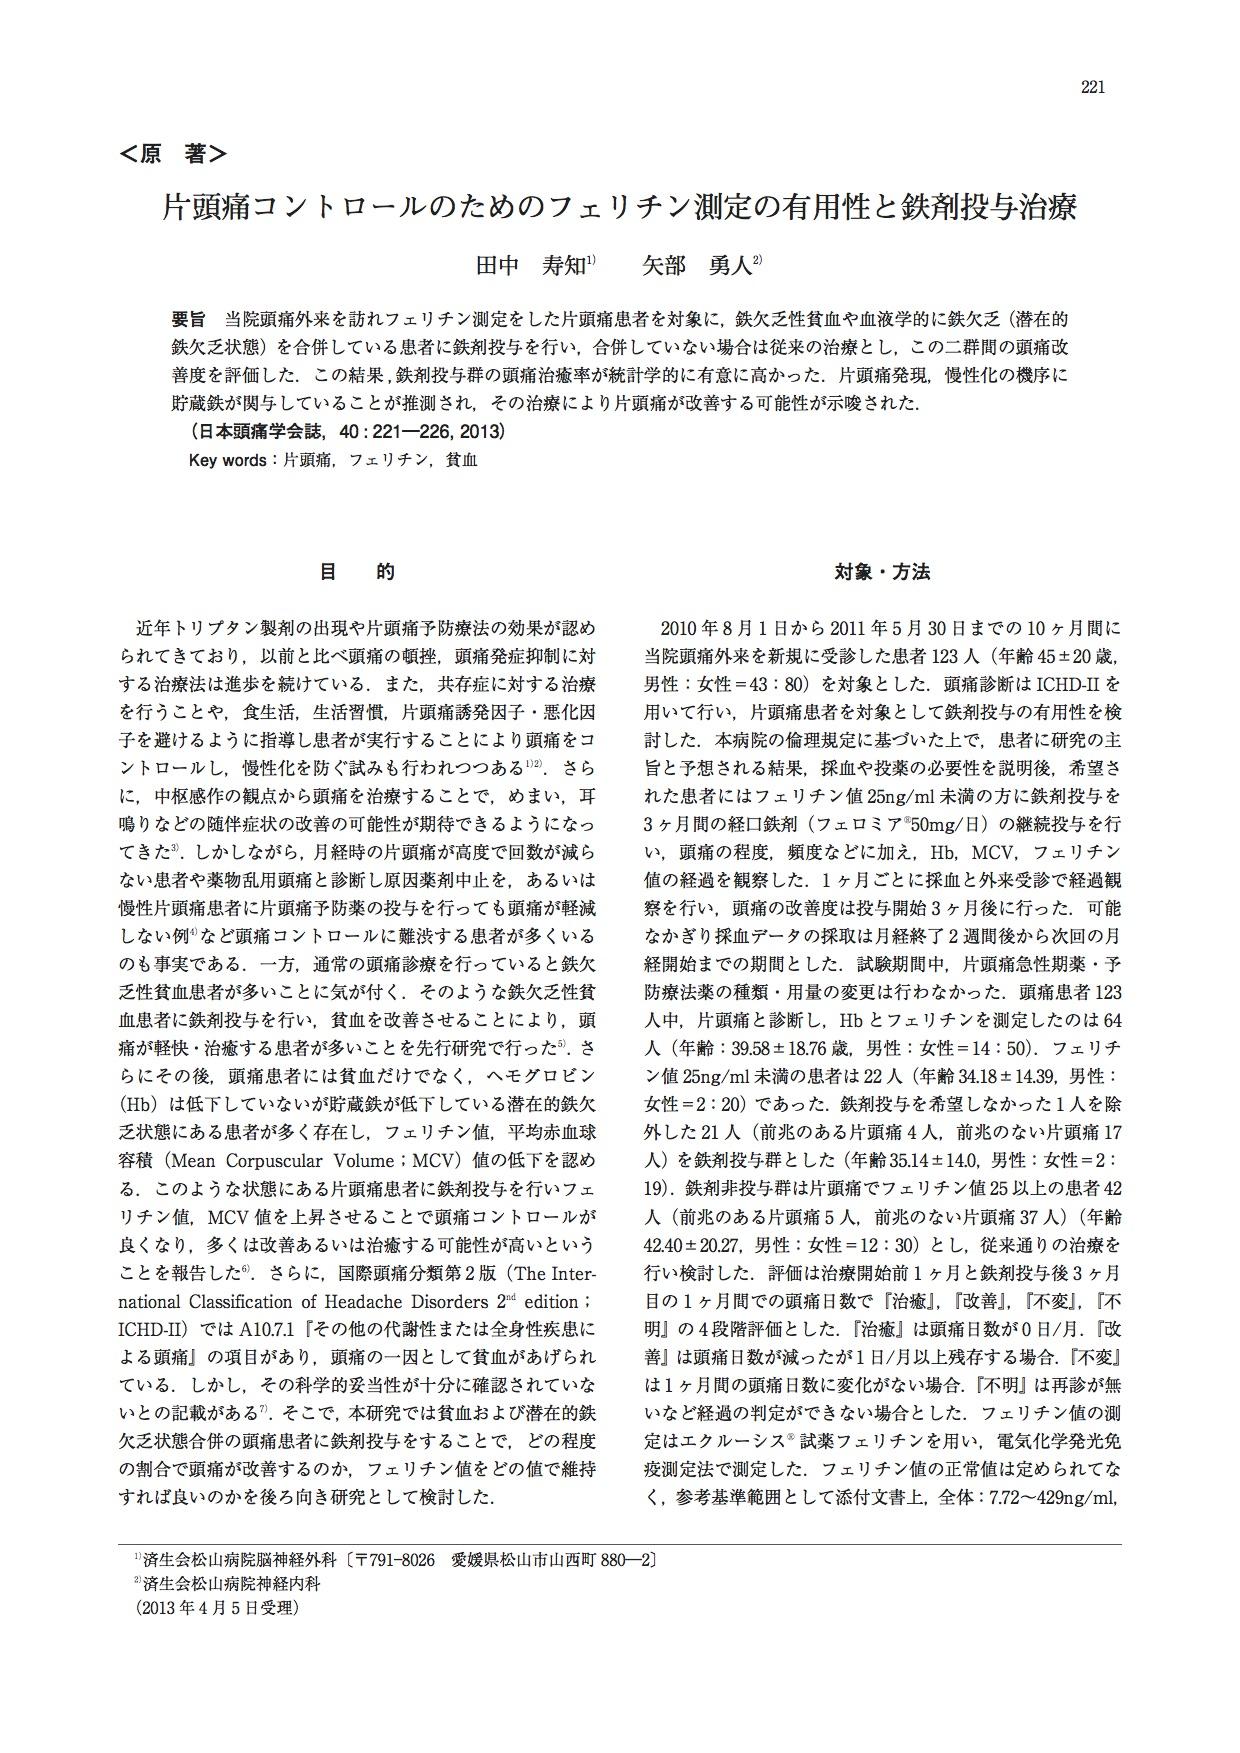 2013_40_no1.鉄剤投与pdf.jpg